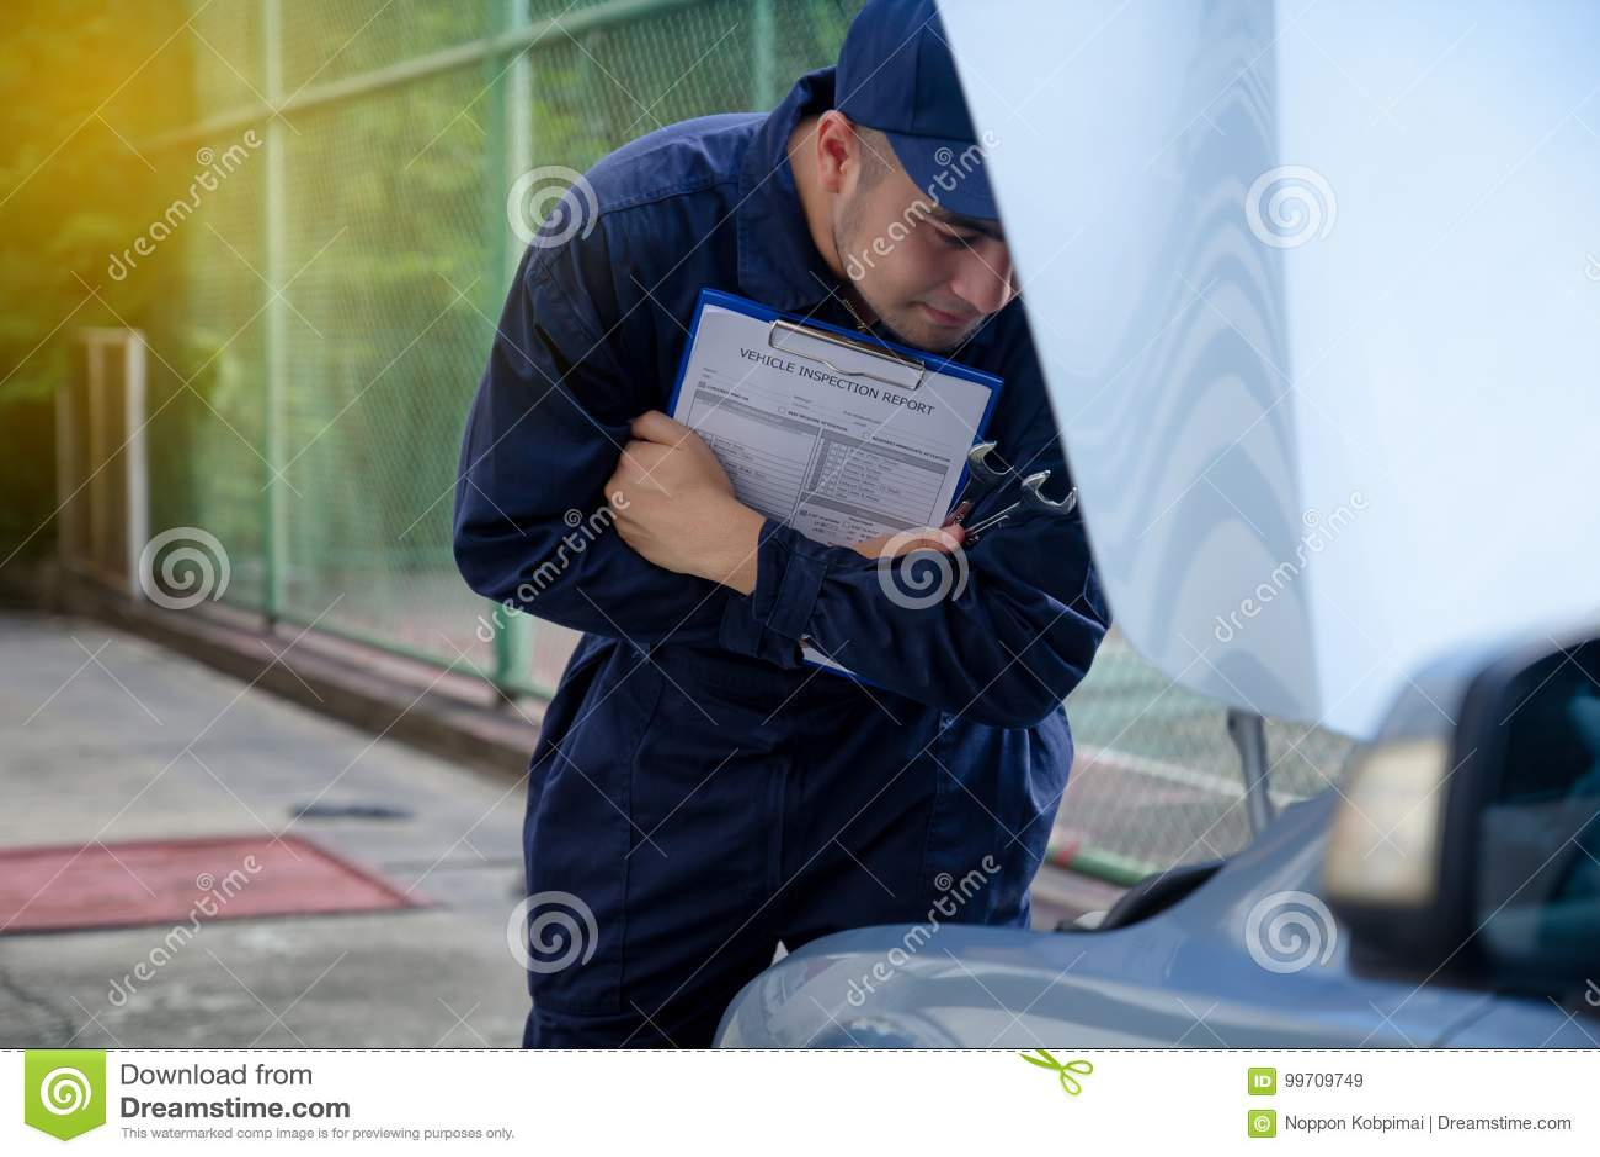 mechanic repairman inspecting car maintaining car records stock